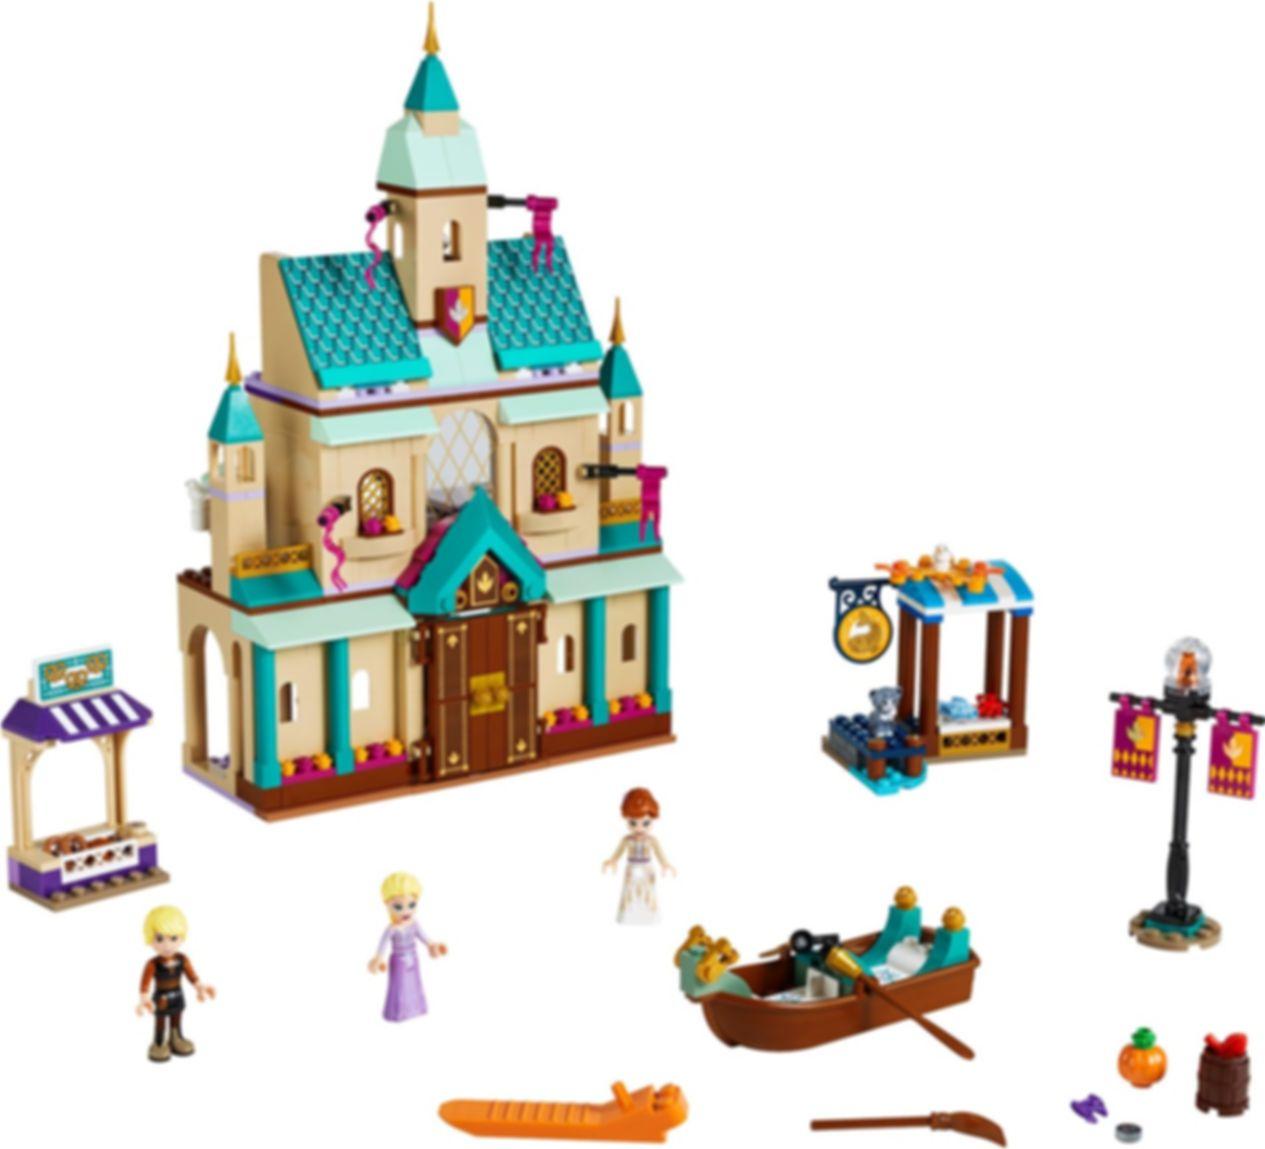 LEGO® Disney Arendelle Castle Village components